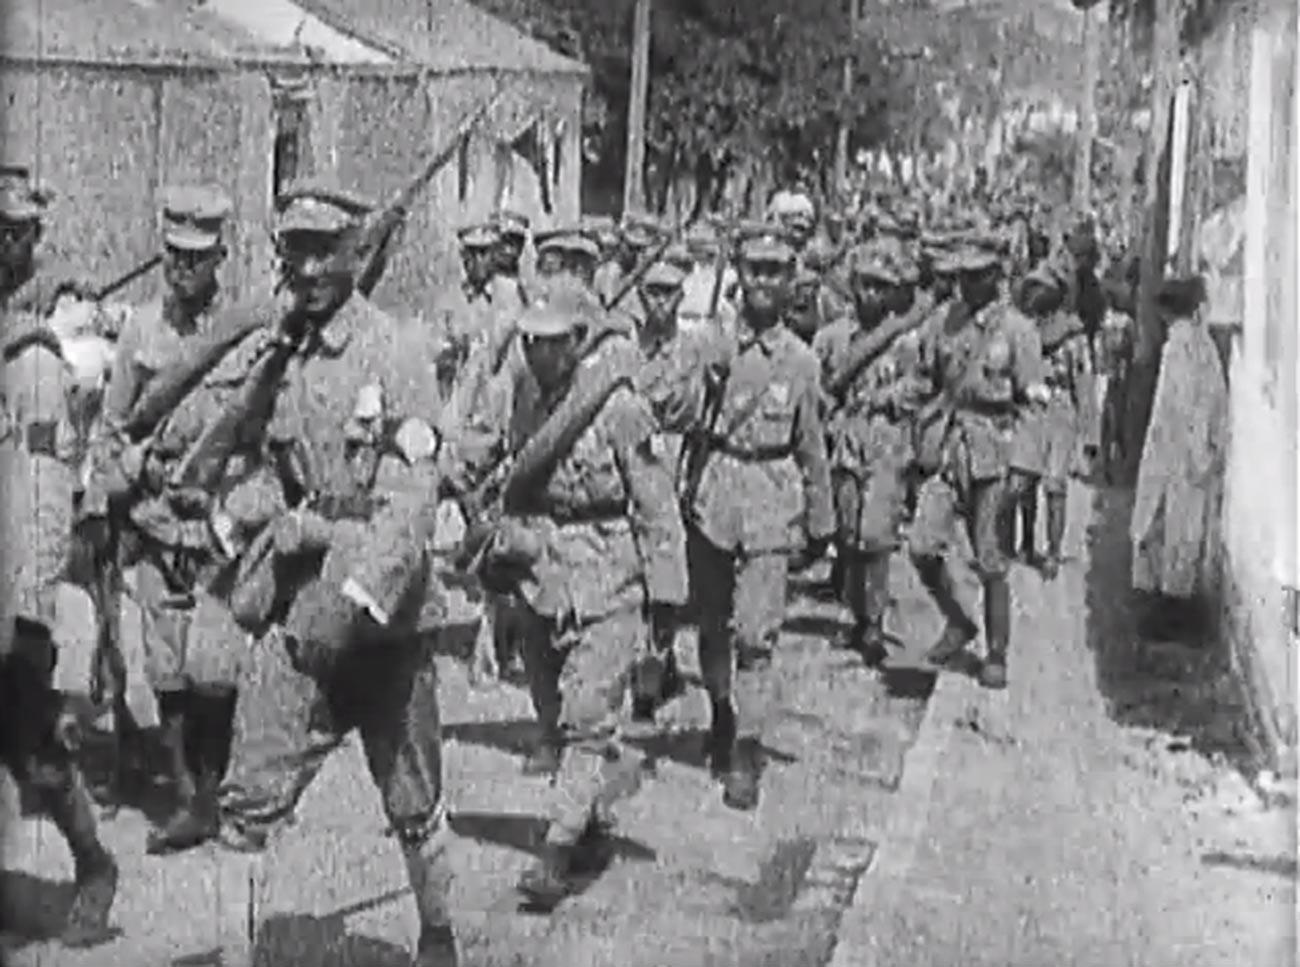 Truppen der Nationalen Revolutionsarmee